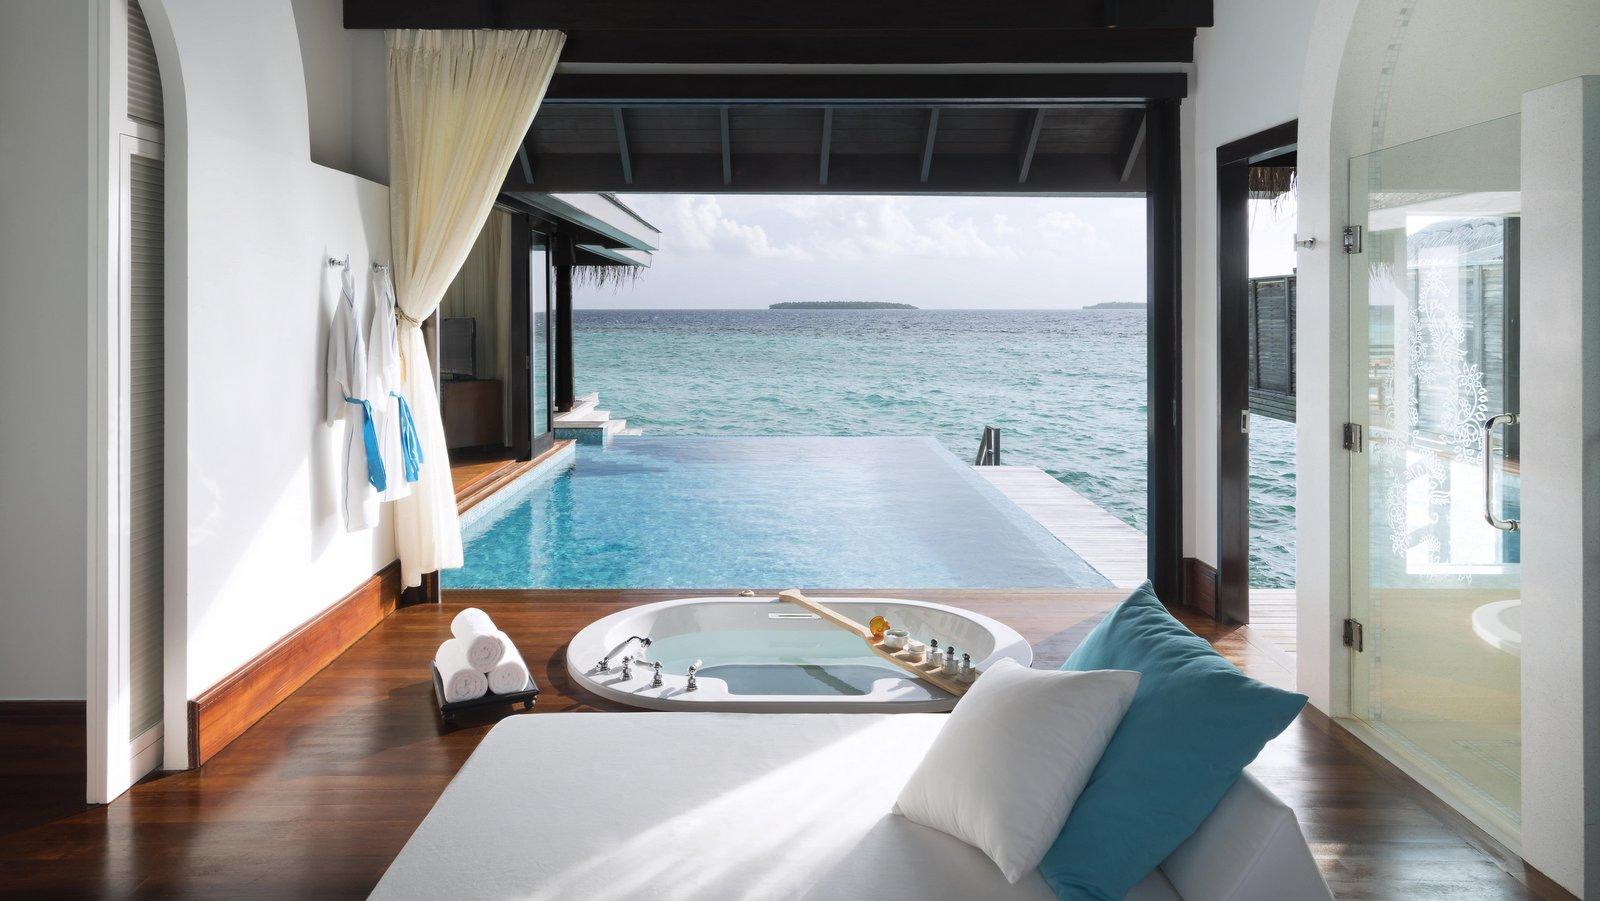 Мальдивы, отель Anantara Kihavah Maldives Villas, номер Over Water Pool Villa